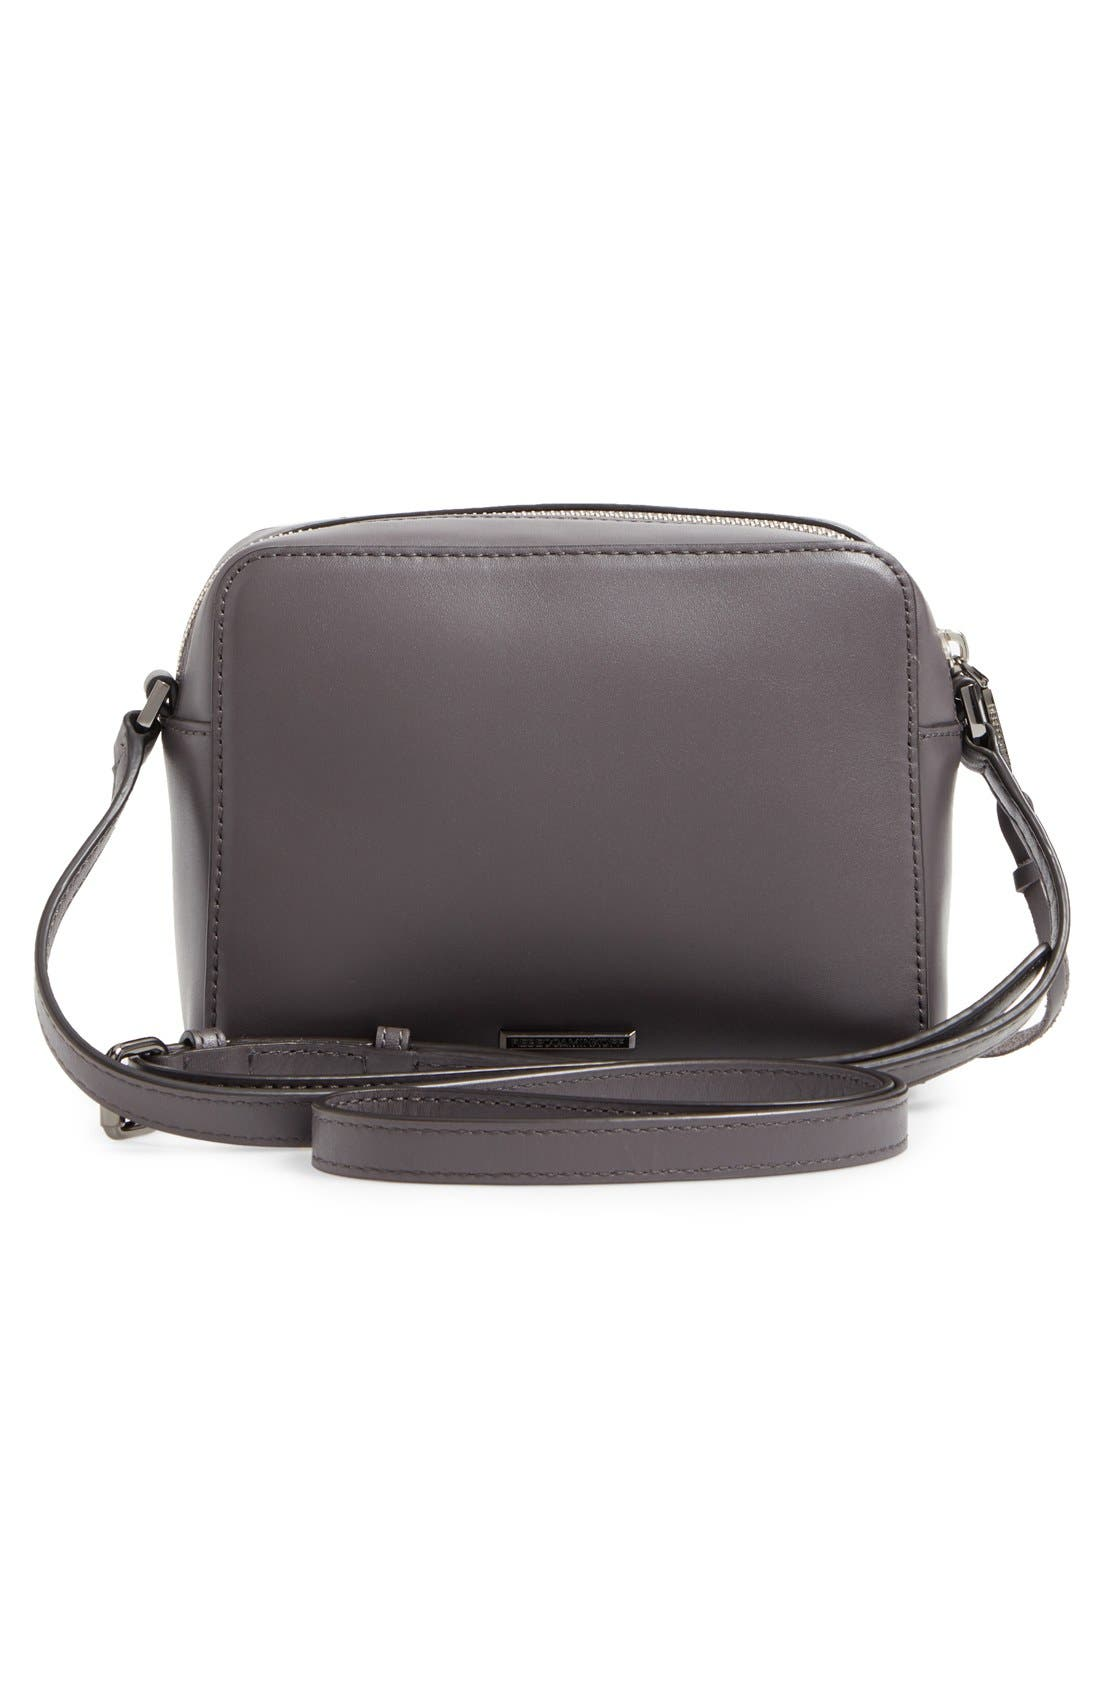 Alternate Image 3  - Rebecca Minkoff Mini Sofia Leather Crossbody Bag